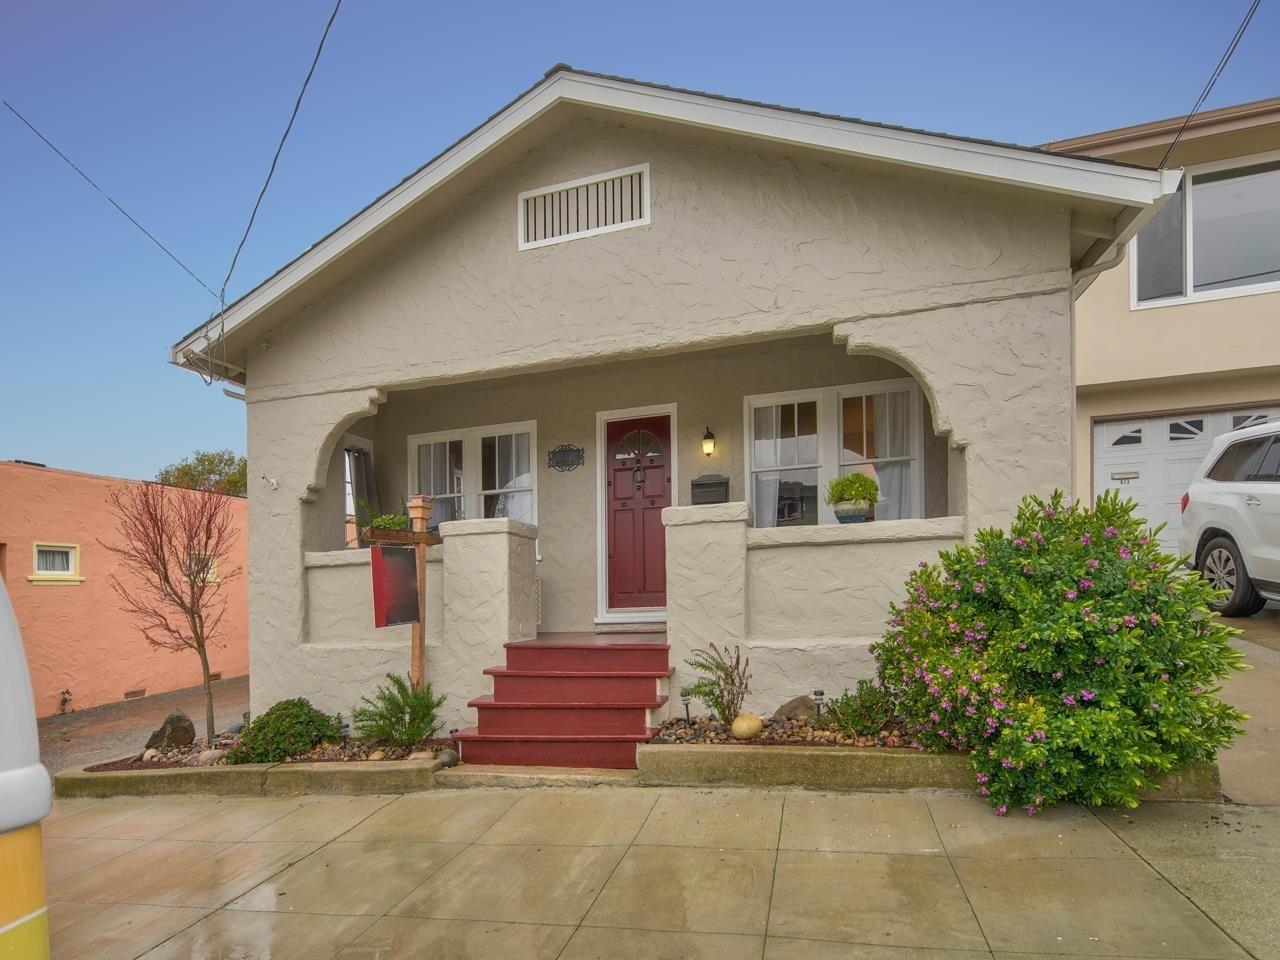 Photo for 967 Roosevelt ST, MONTEREY, CA 93940 (MLS # ML81834901)